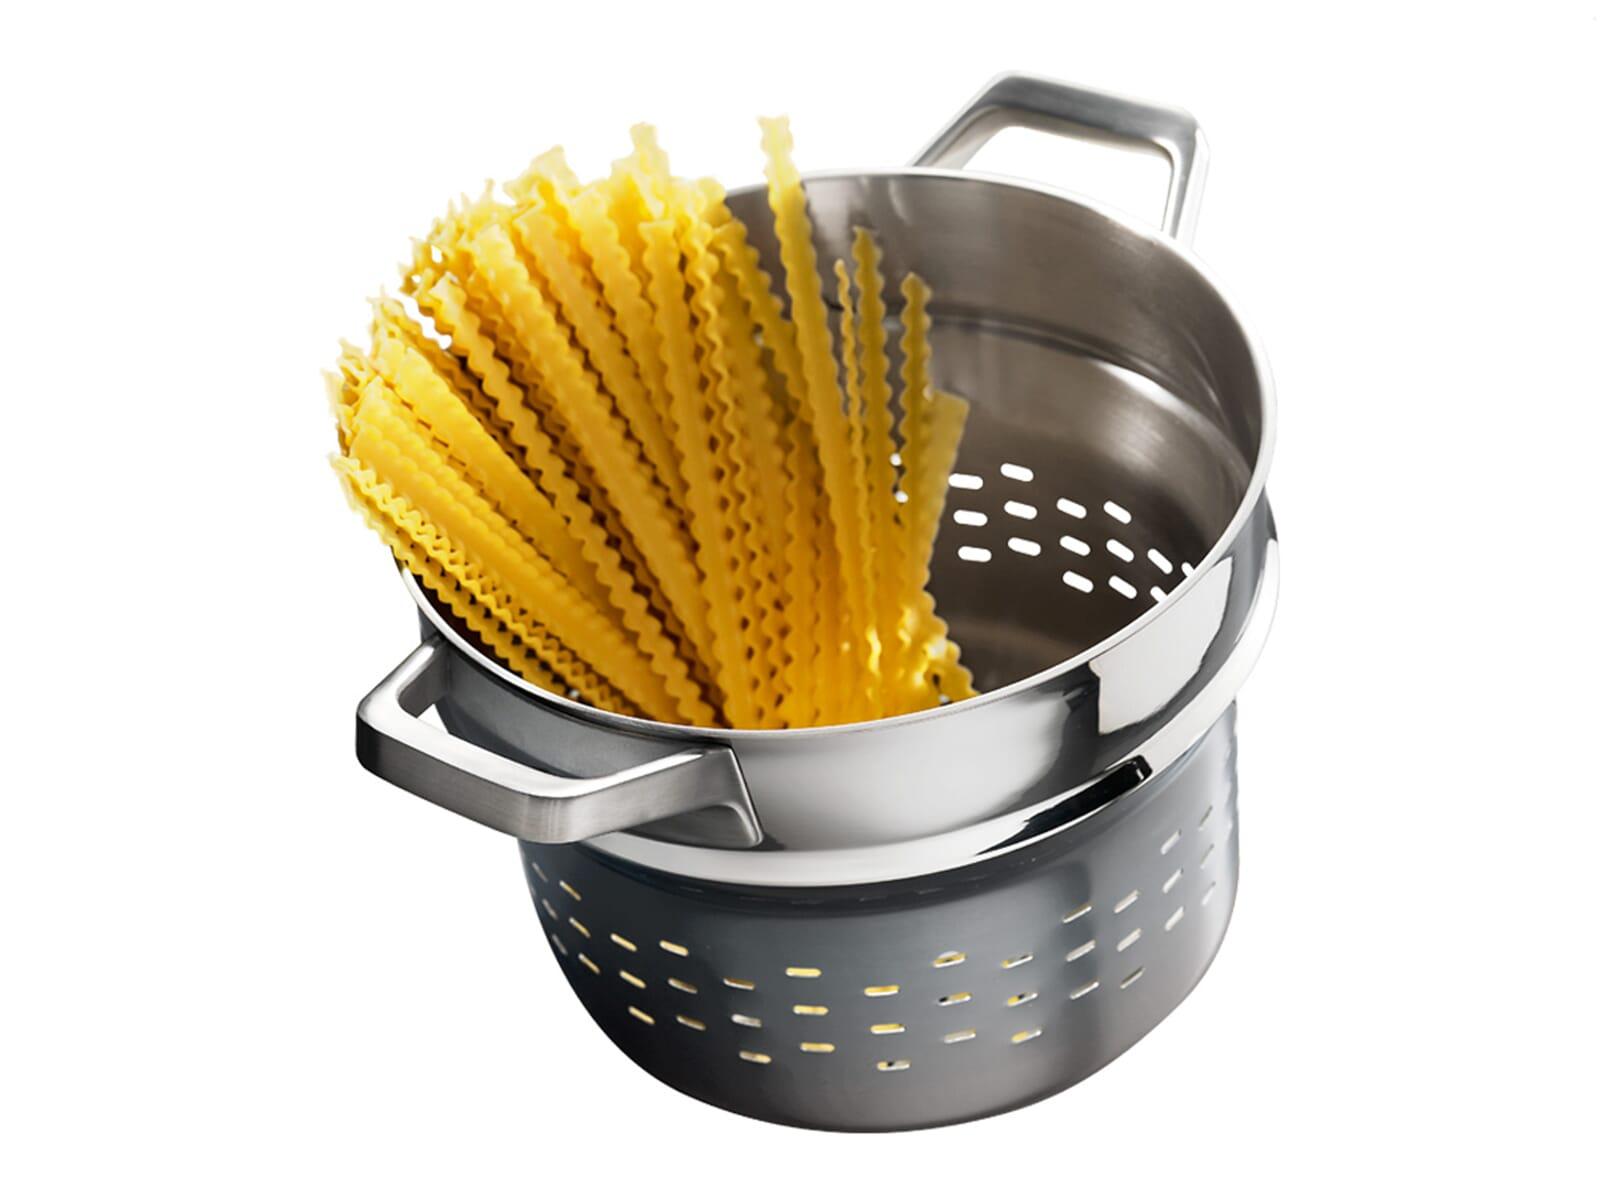 AEG A9ALPS01 Pasta-Einsatz